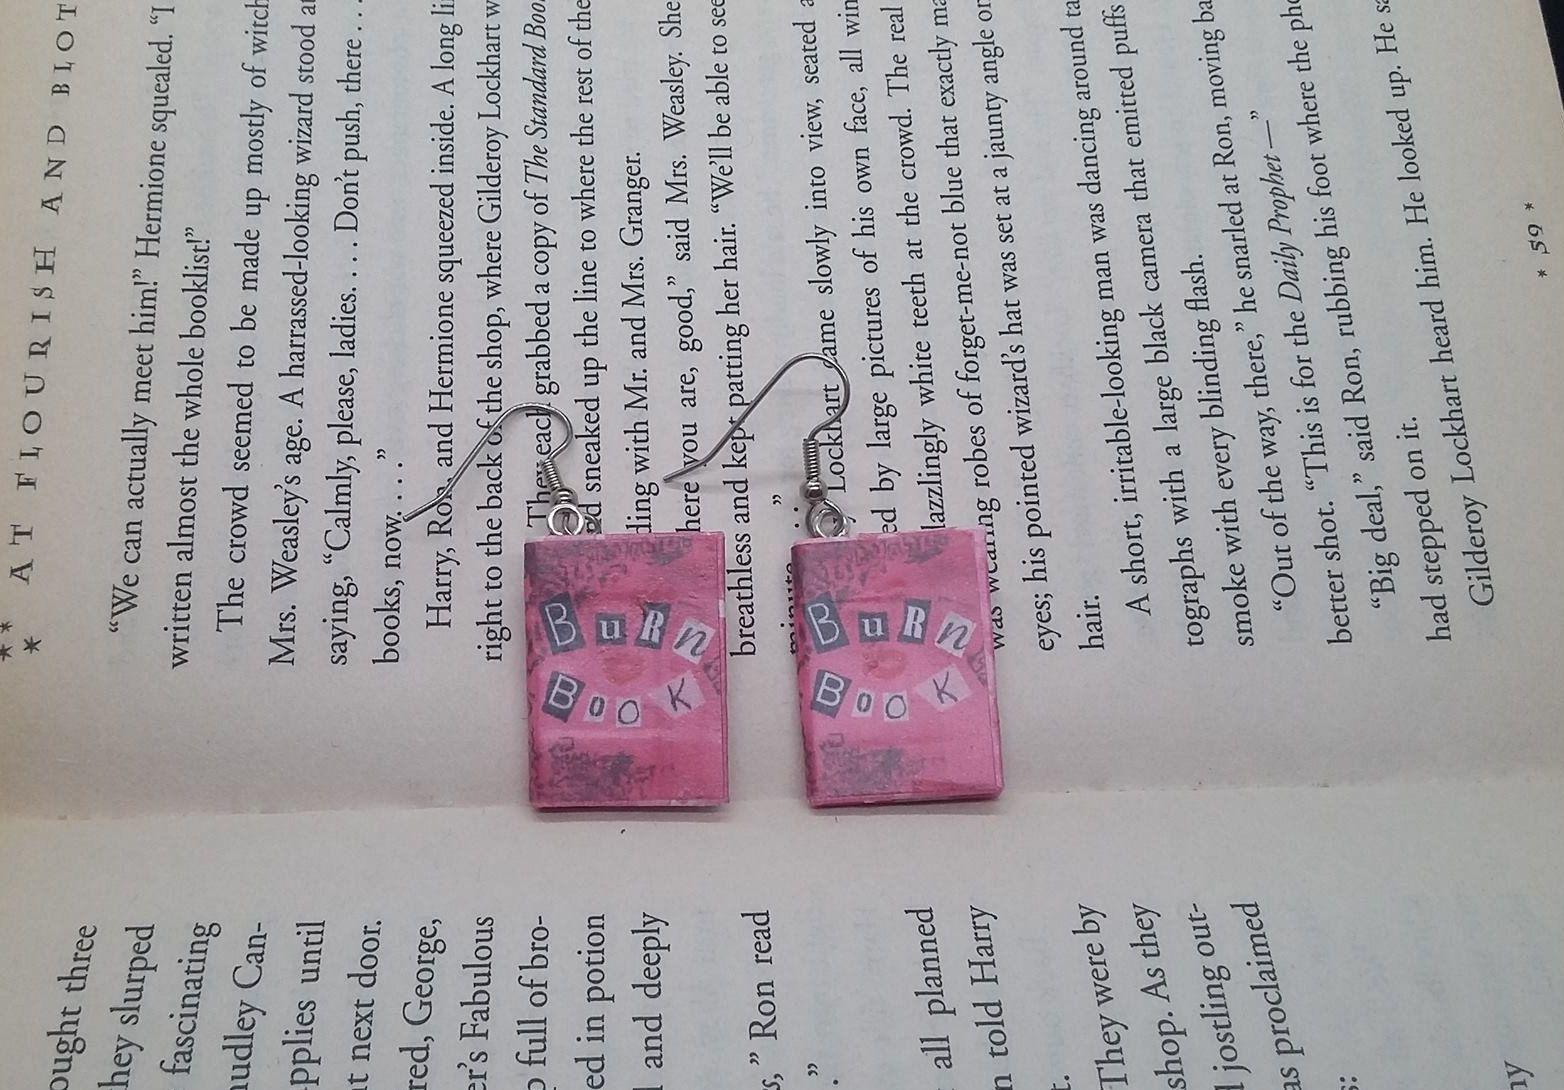 Book Earrings Burn Book Earrings Mean Girls Earrings Etsy Book Earrings Book Jewelry Book Pendant